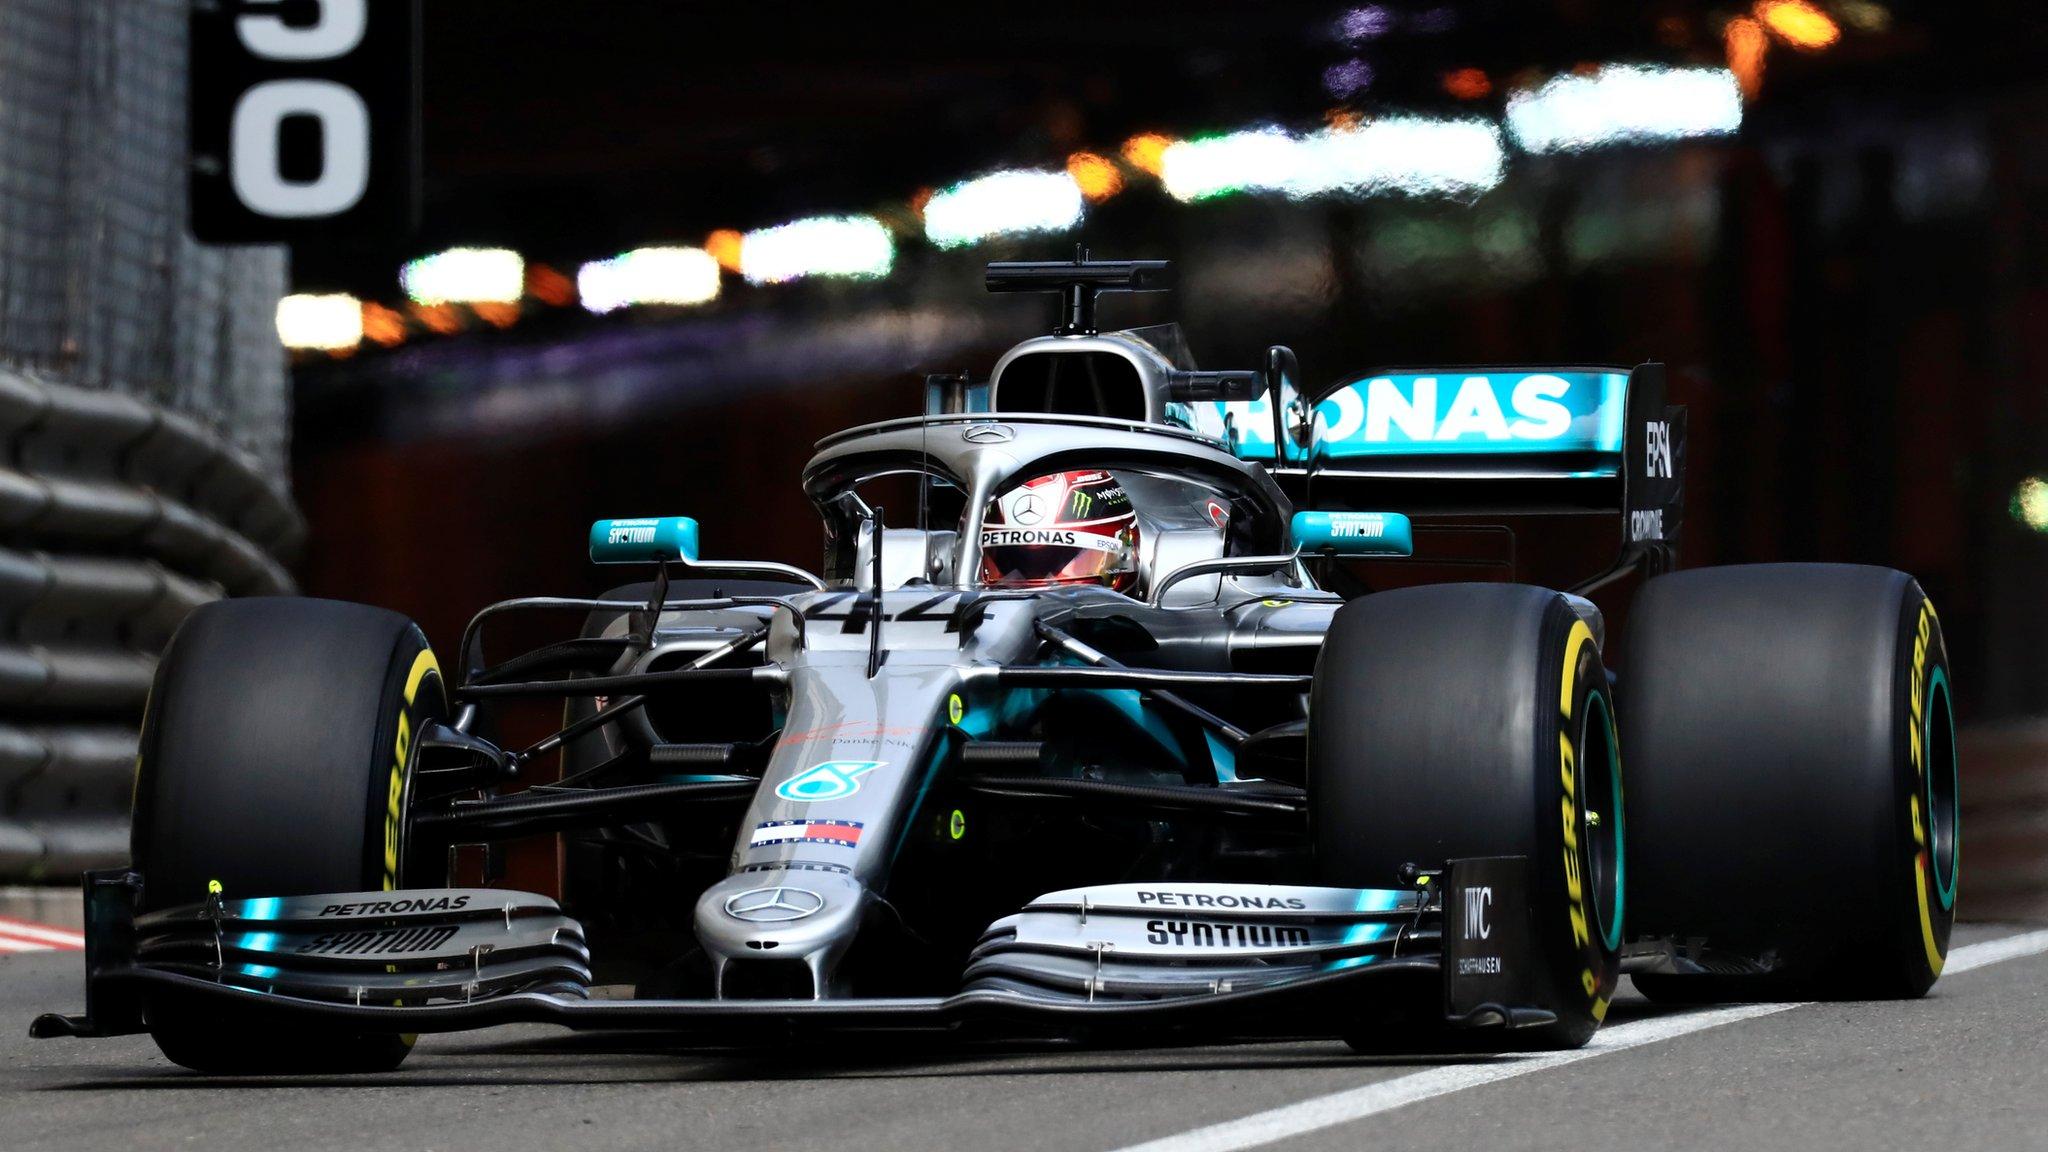 Monaco Grand Prix: Lewis Hamilton leads Mercedes one-two in practice